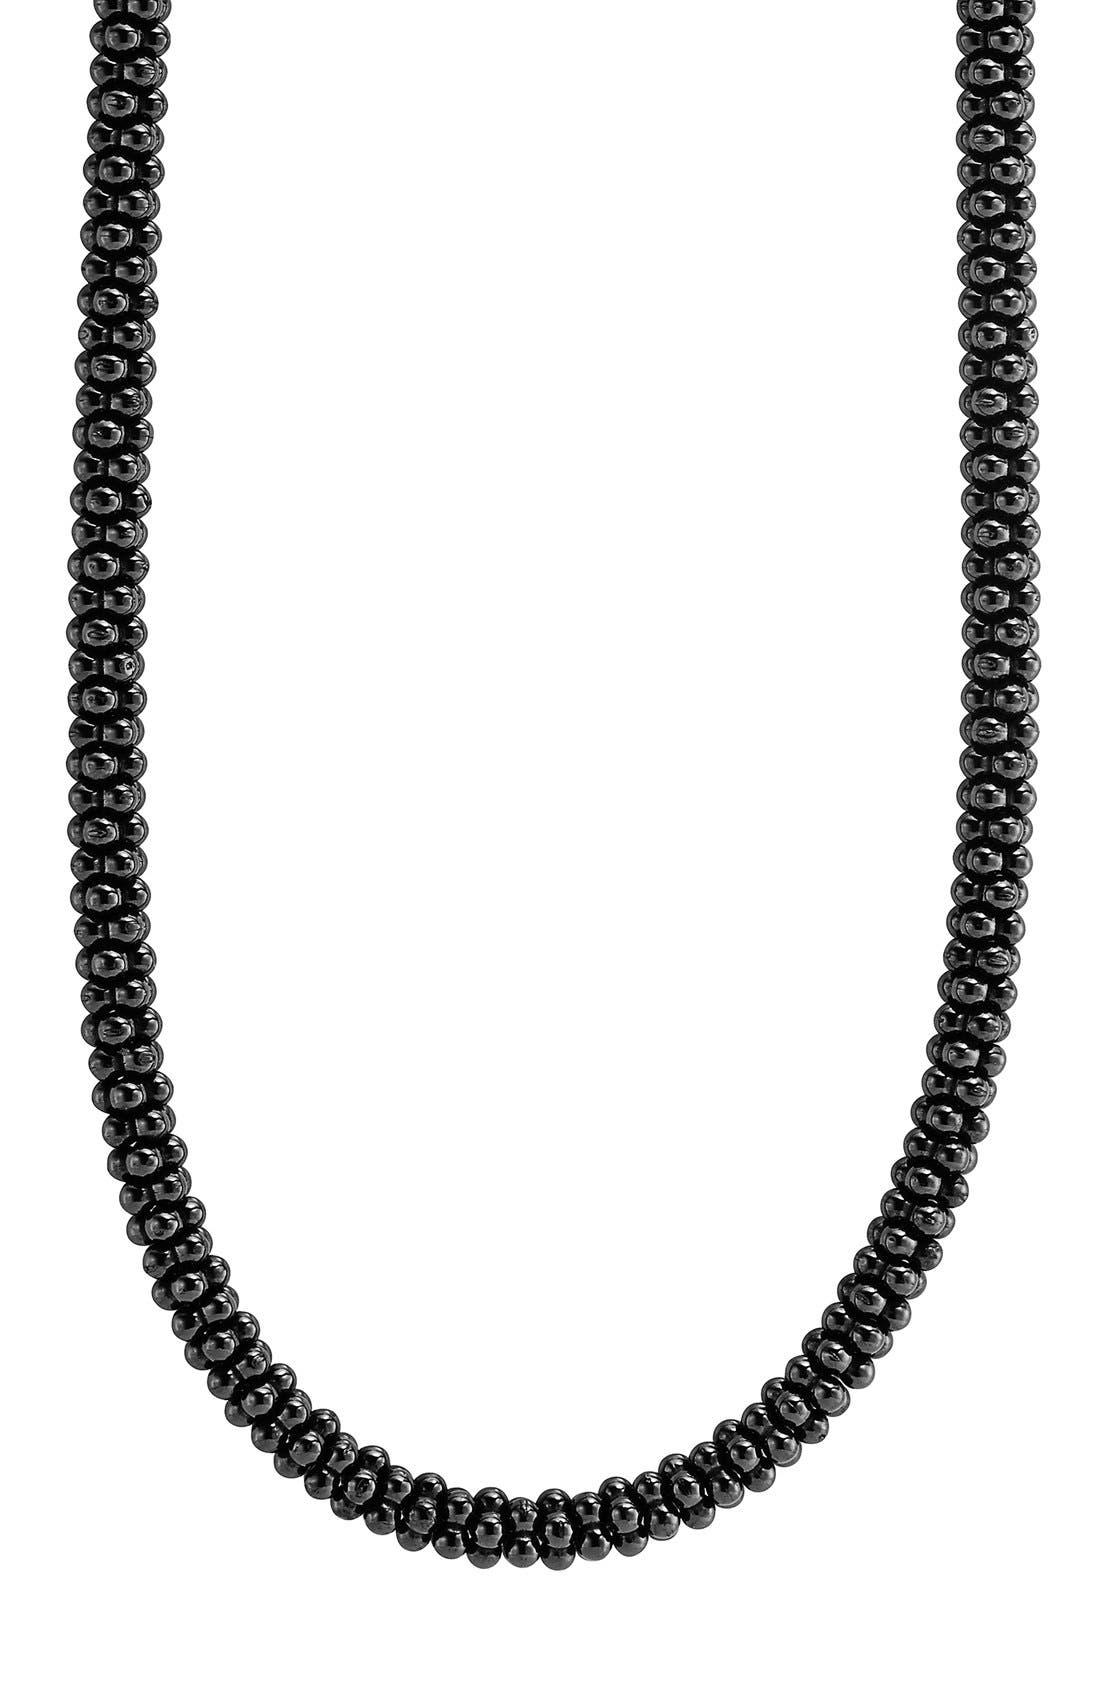 'Black Caviar' 5mm Beaded Necklace,                             Alternate thumbnail 3, color,                             BLACK CAVIAR